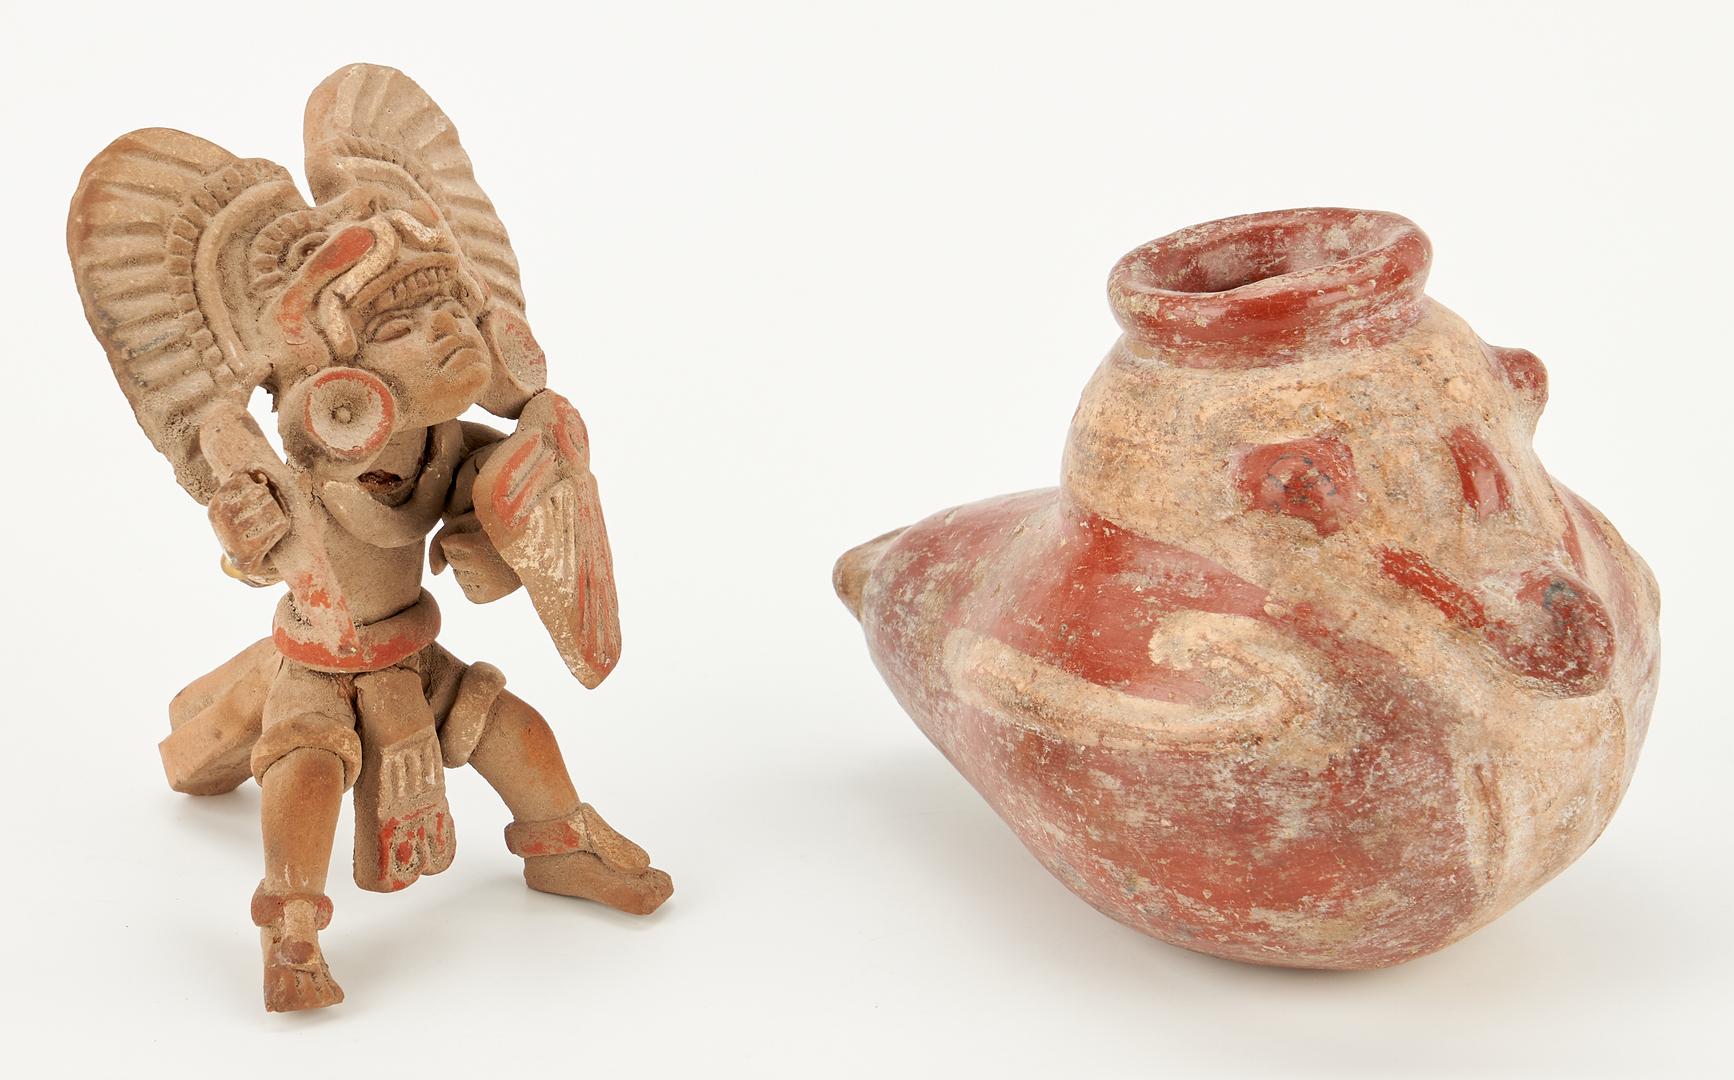 Lot 1124: 10 Pre-Columbian Nicoya, Costa Rica Pottery Items